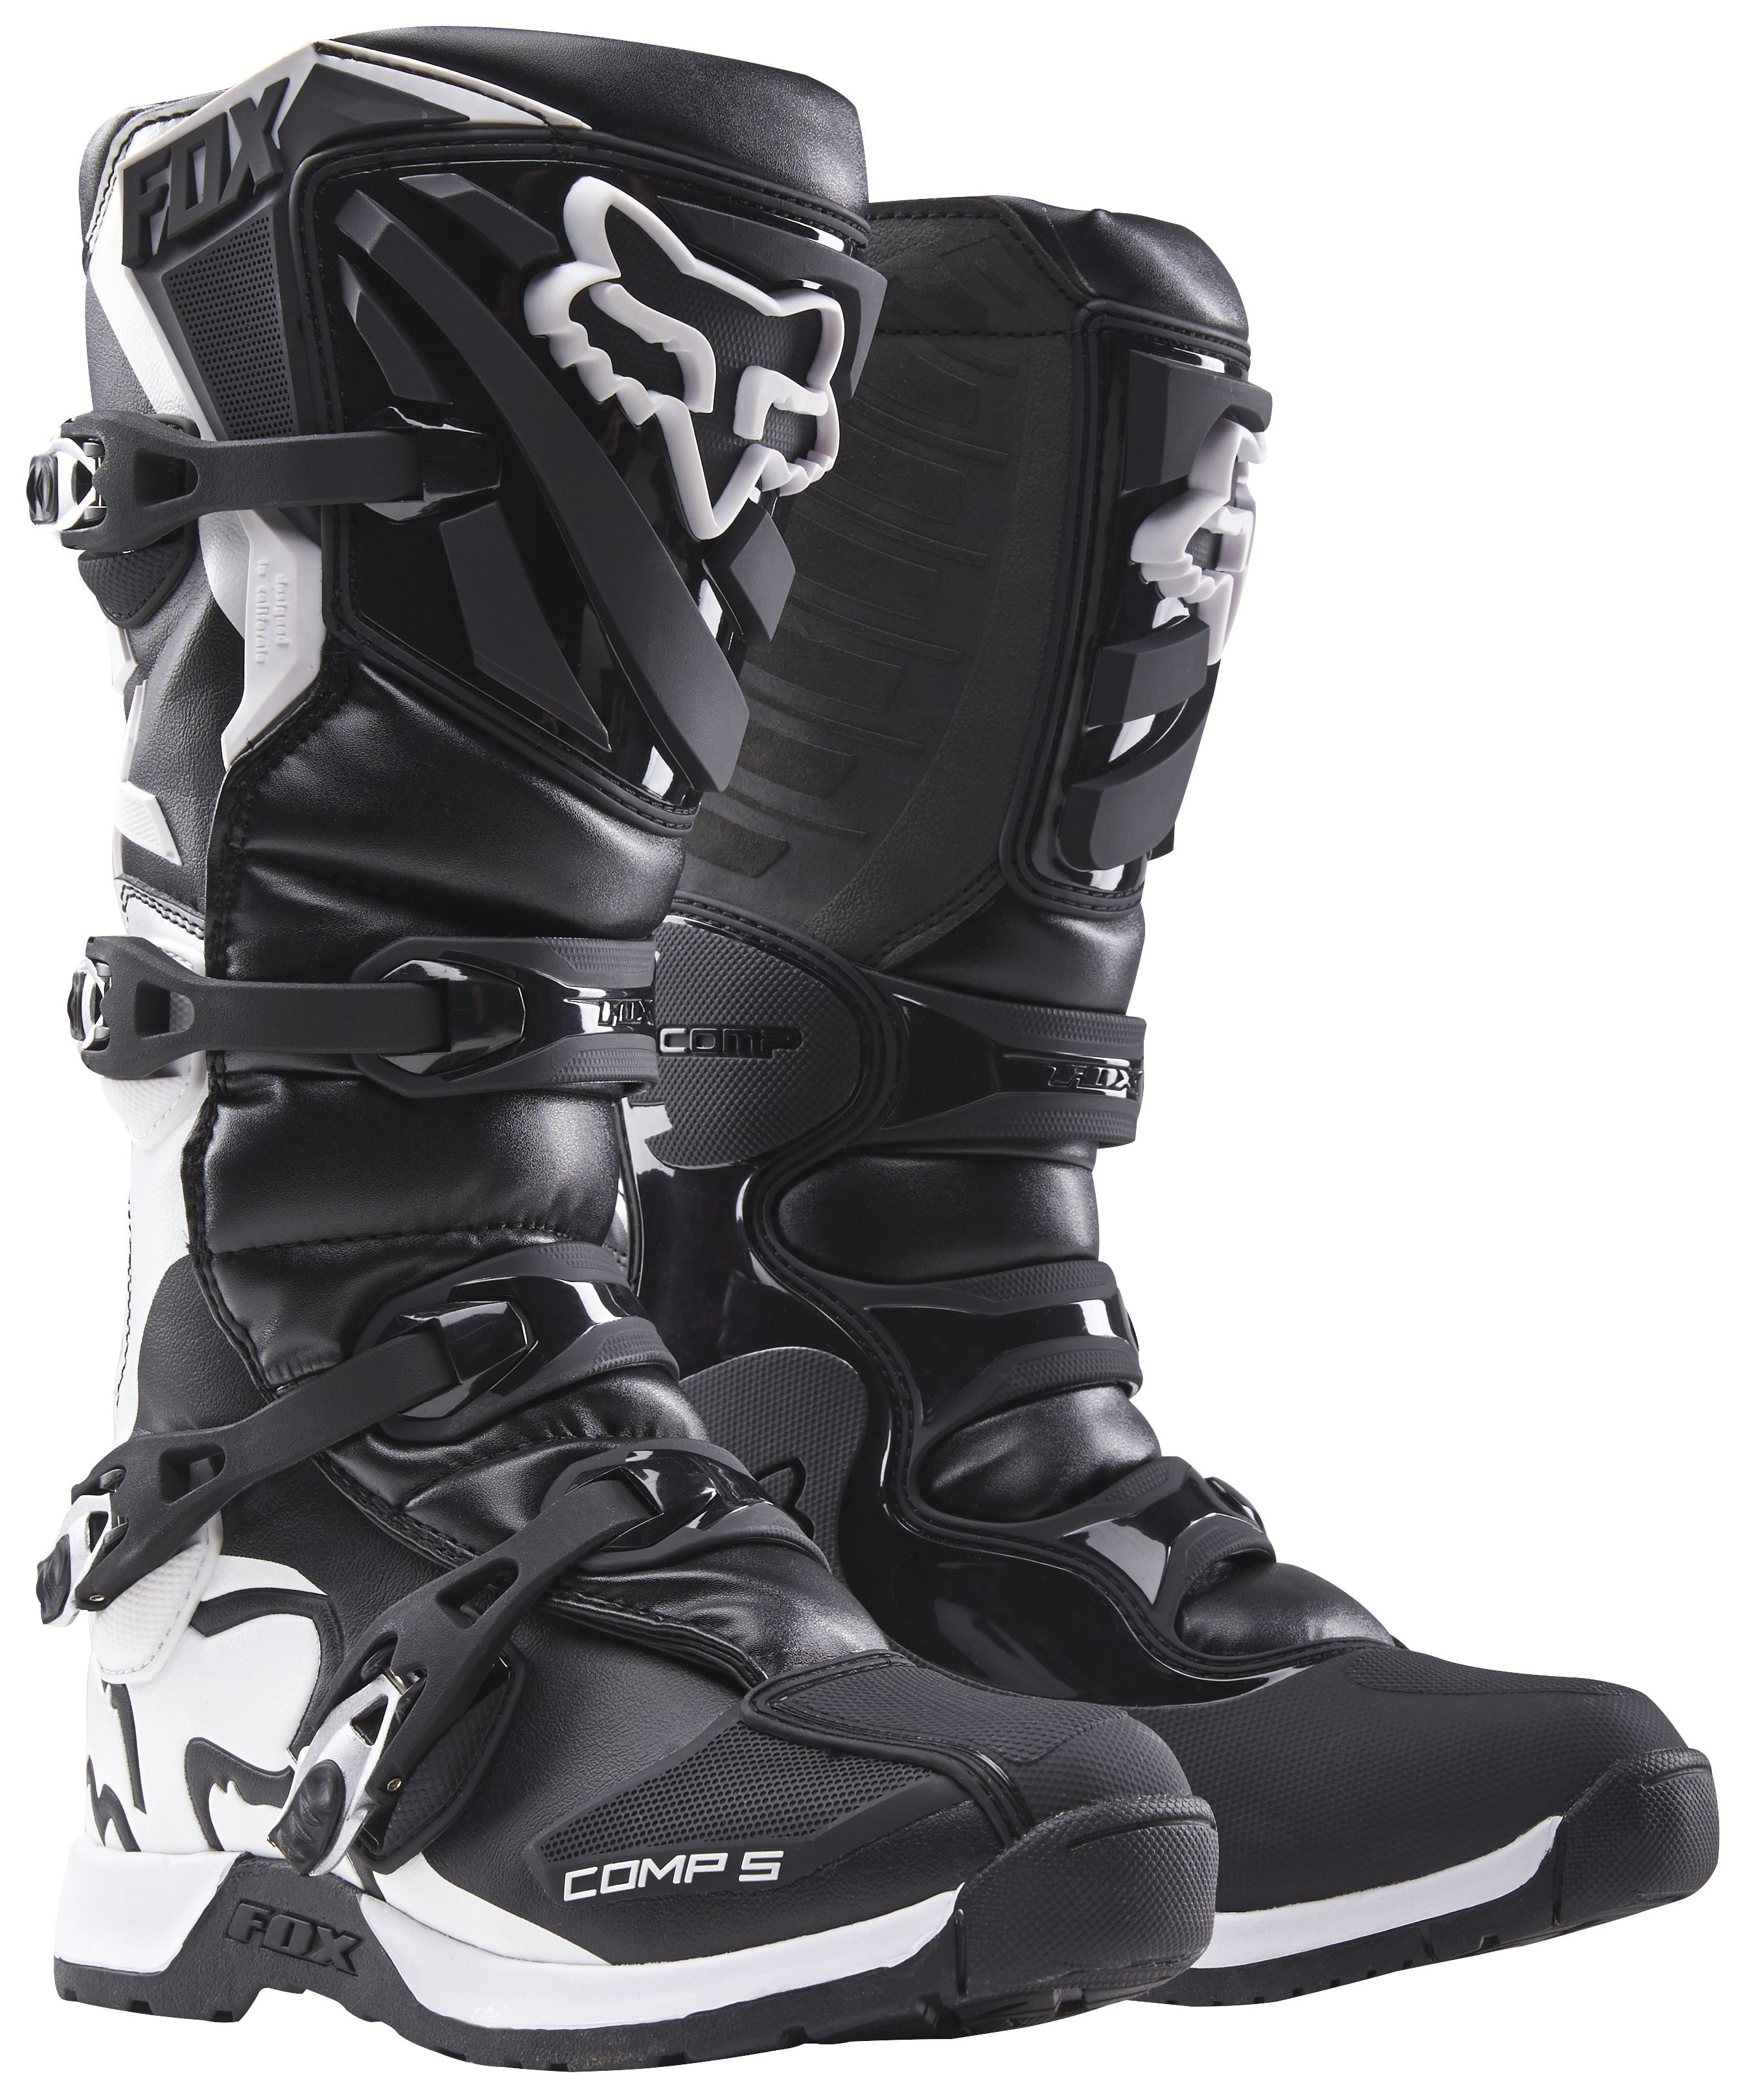 Fox Racing Comp5 Boots